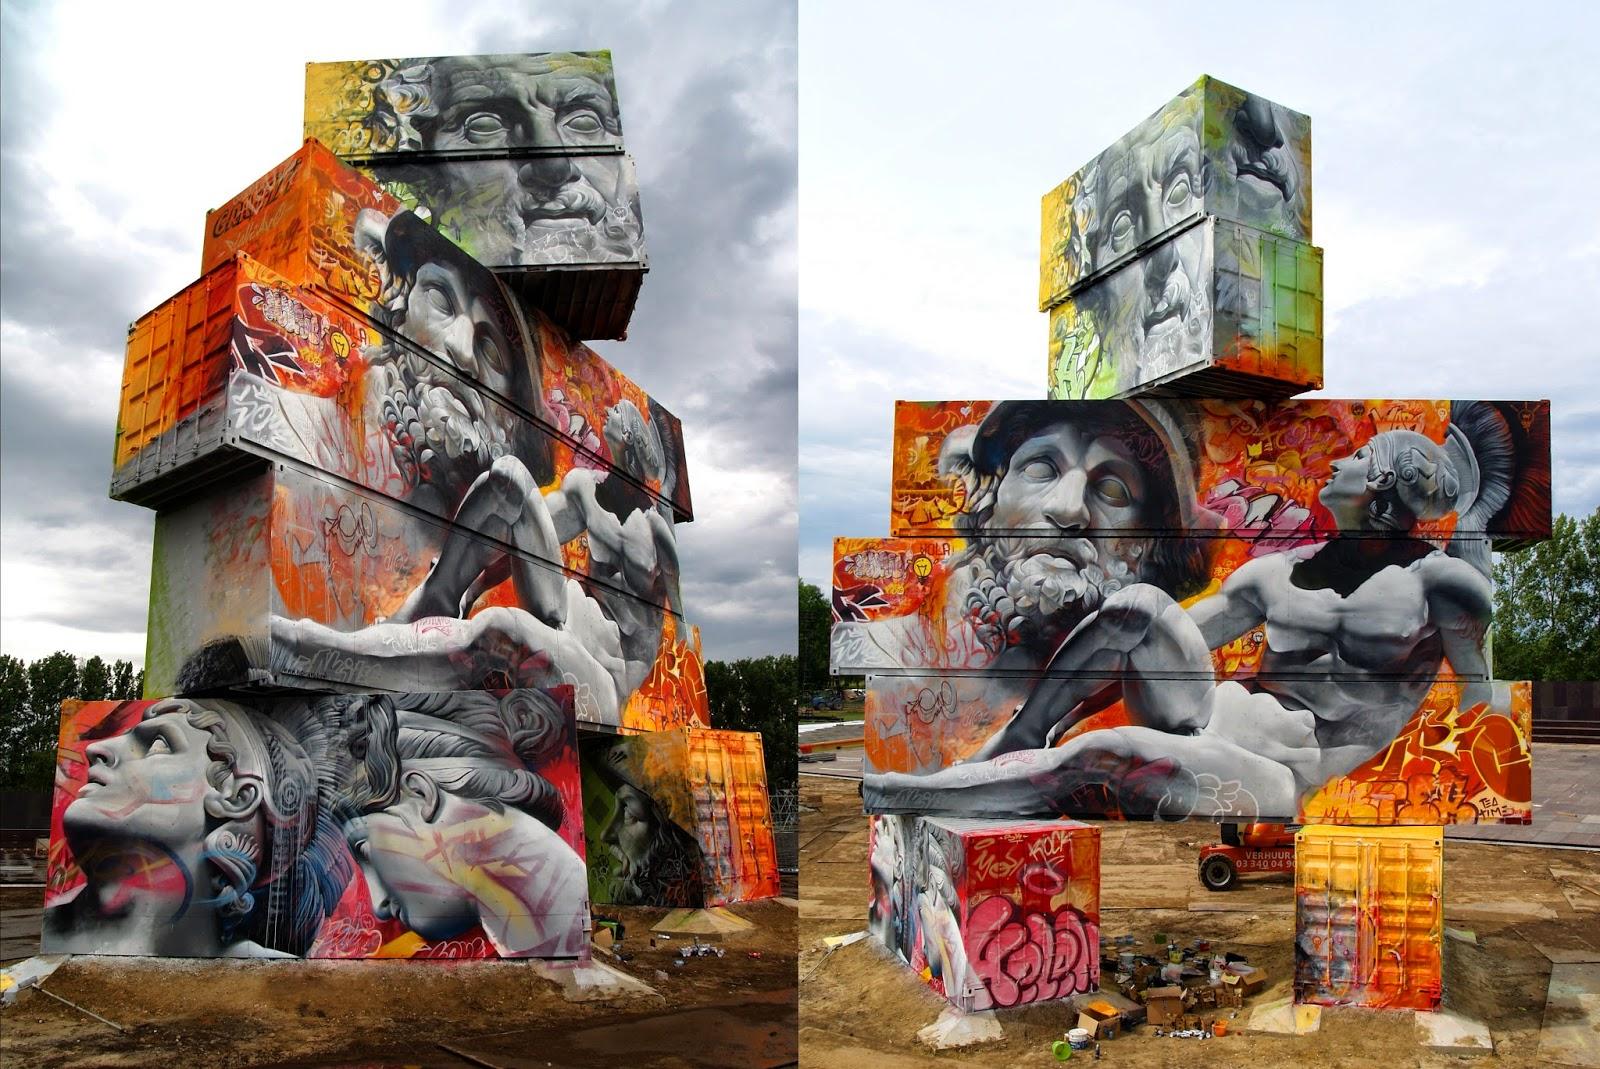 arte clásico en forma de graffiti por PichiAvo